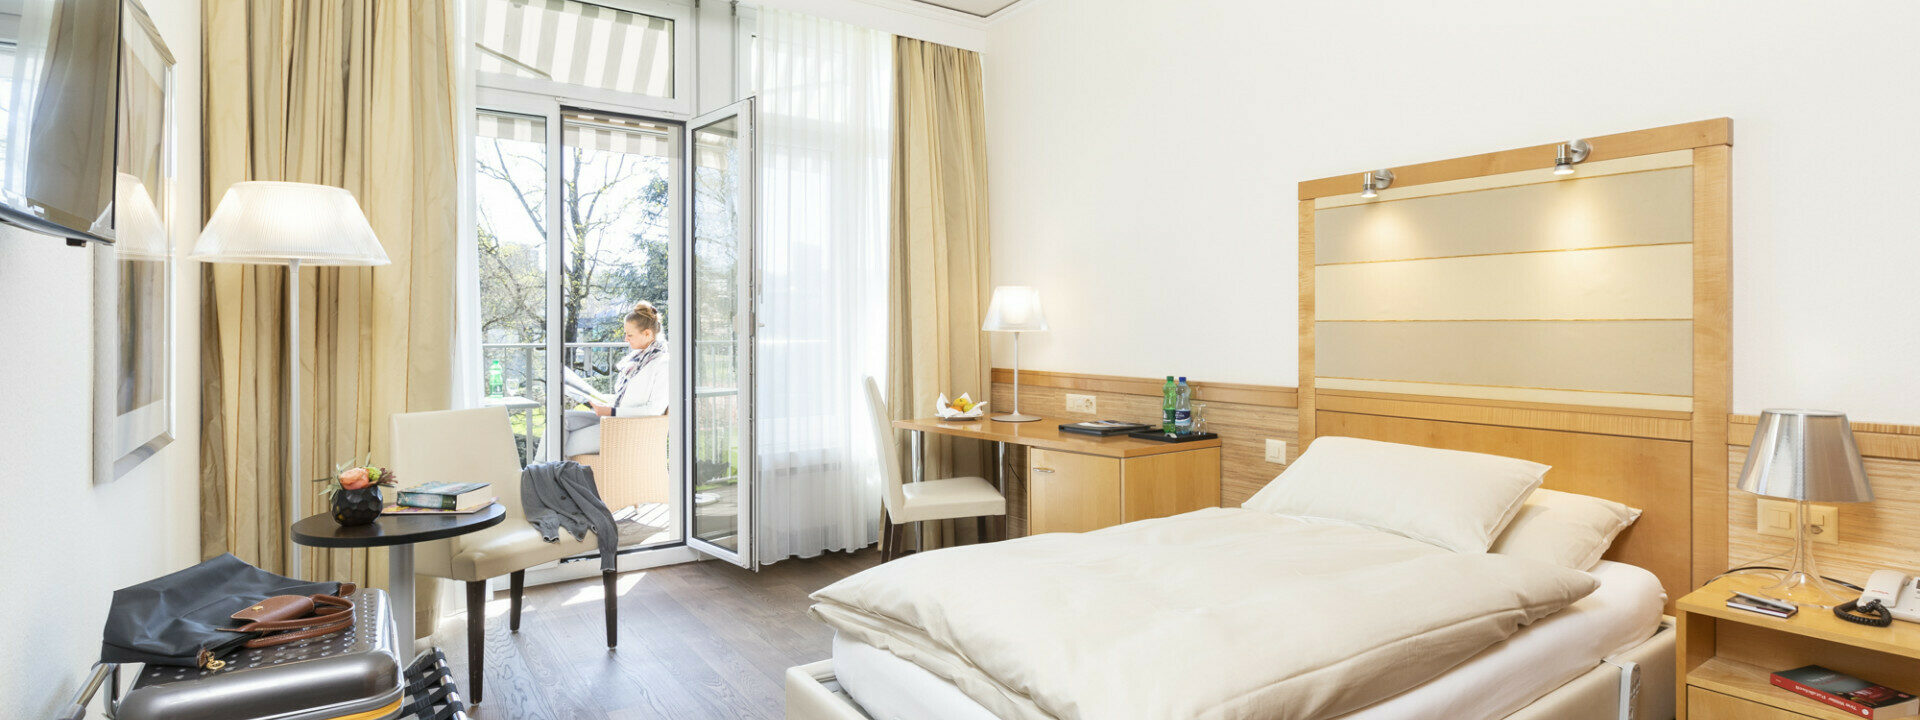 Park-Hotel am Rhein